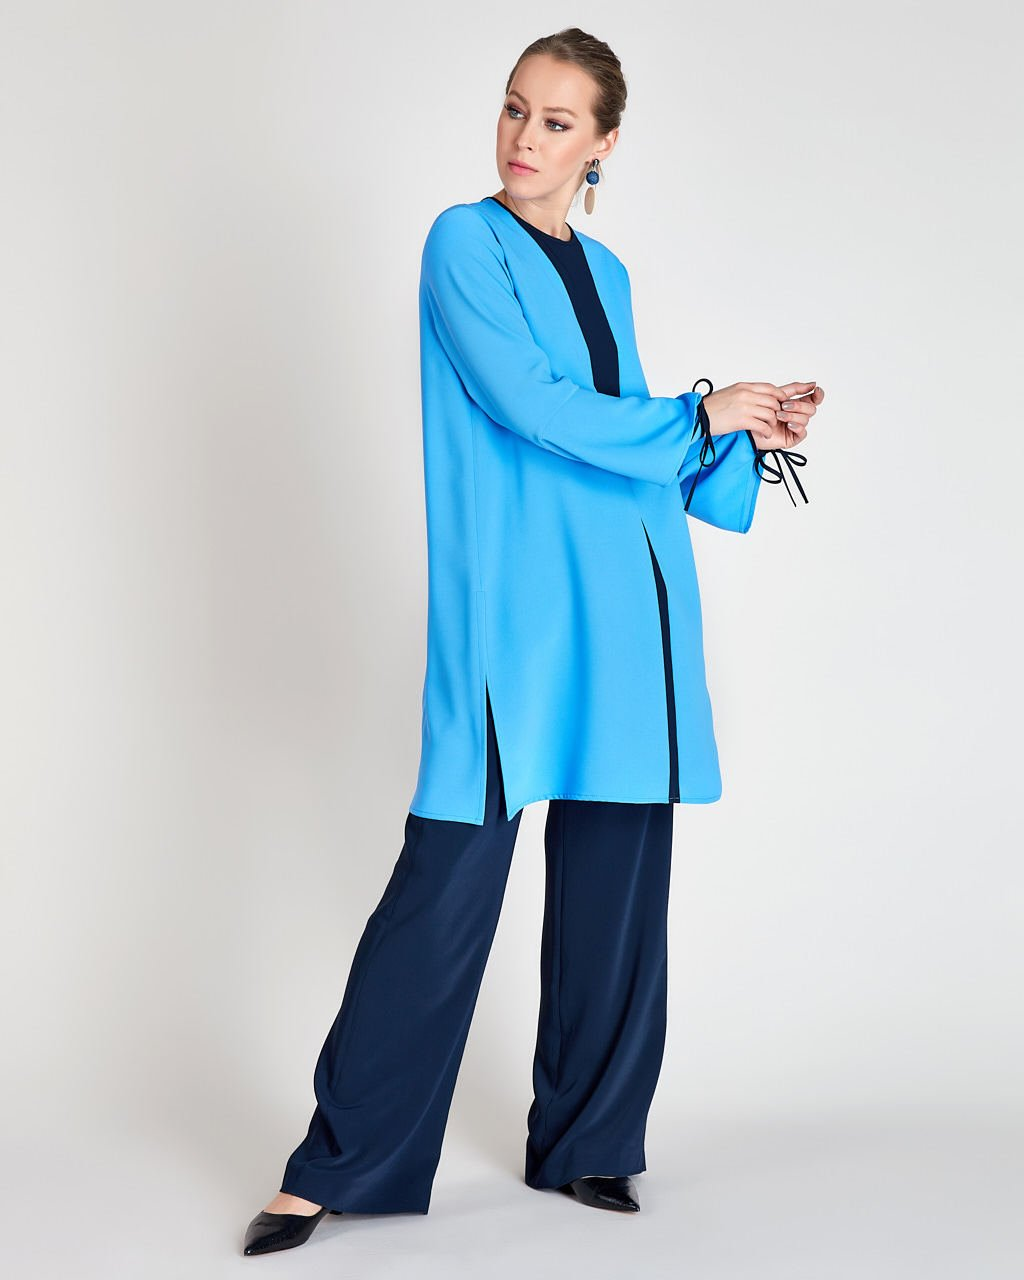 Tunic Suit